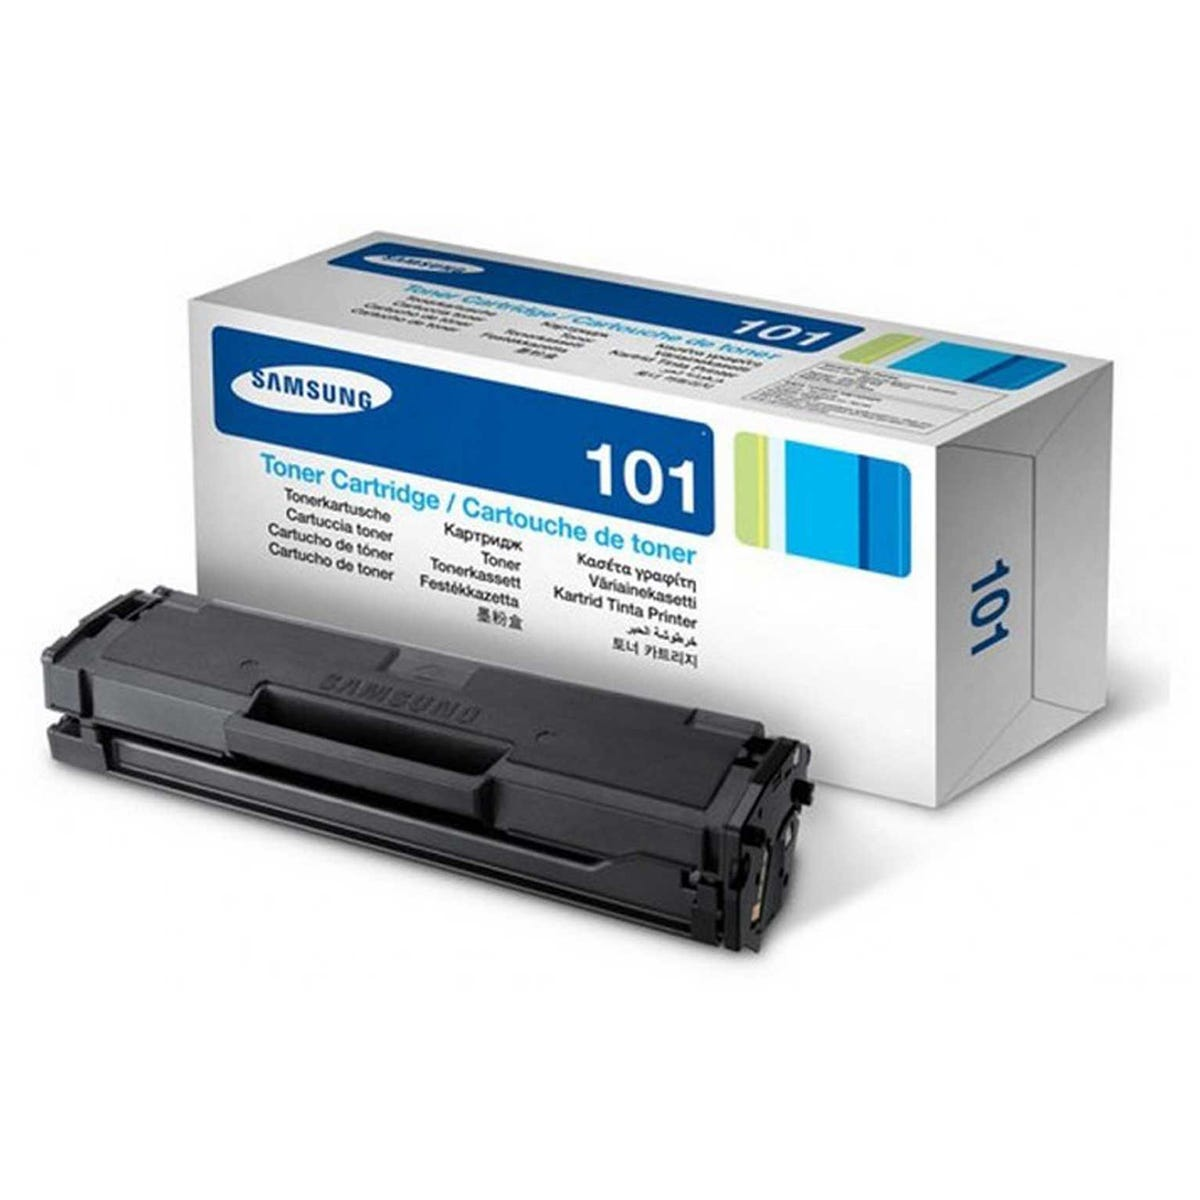 Image of Samsung MLT-D101S Printer Toner Cartridge, Black